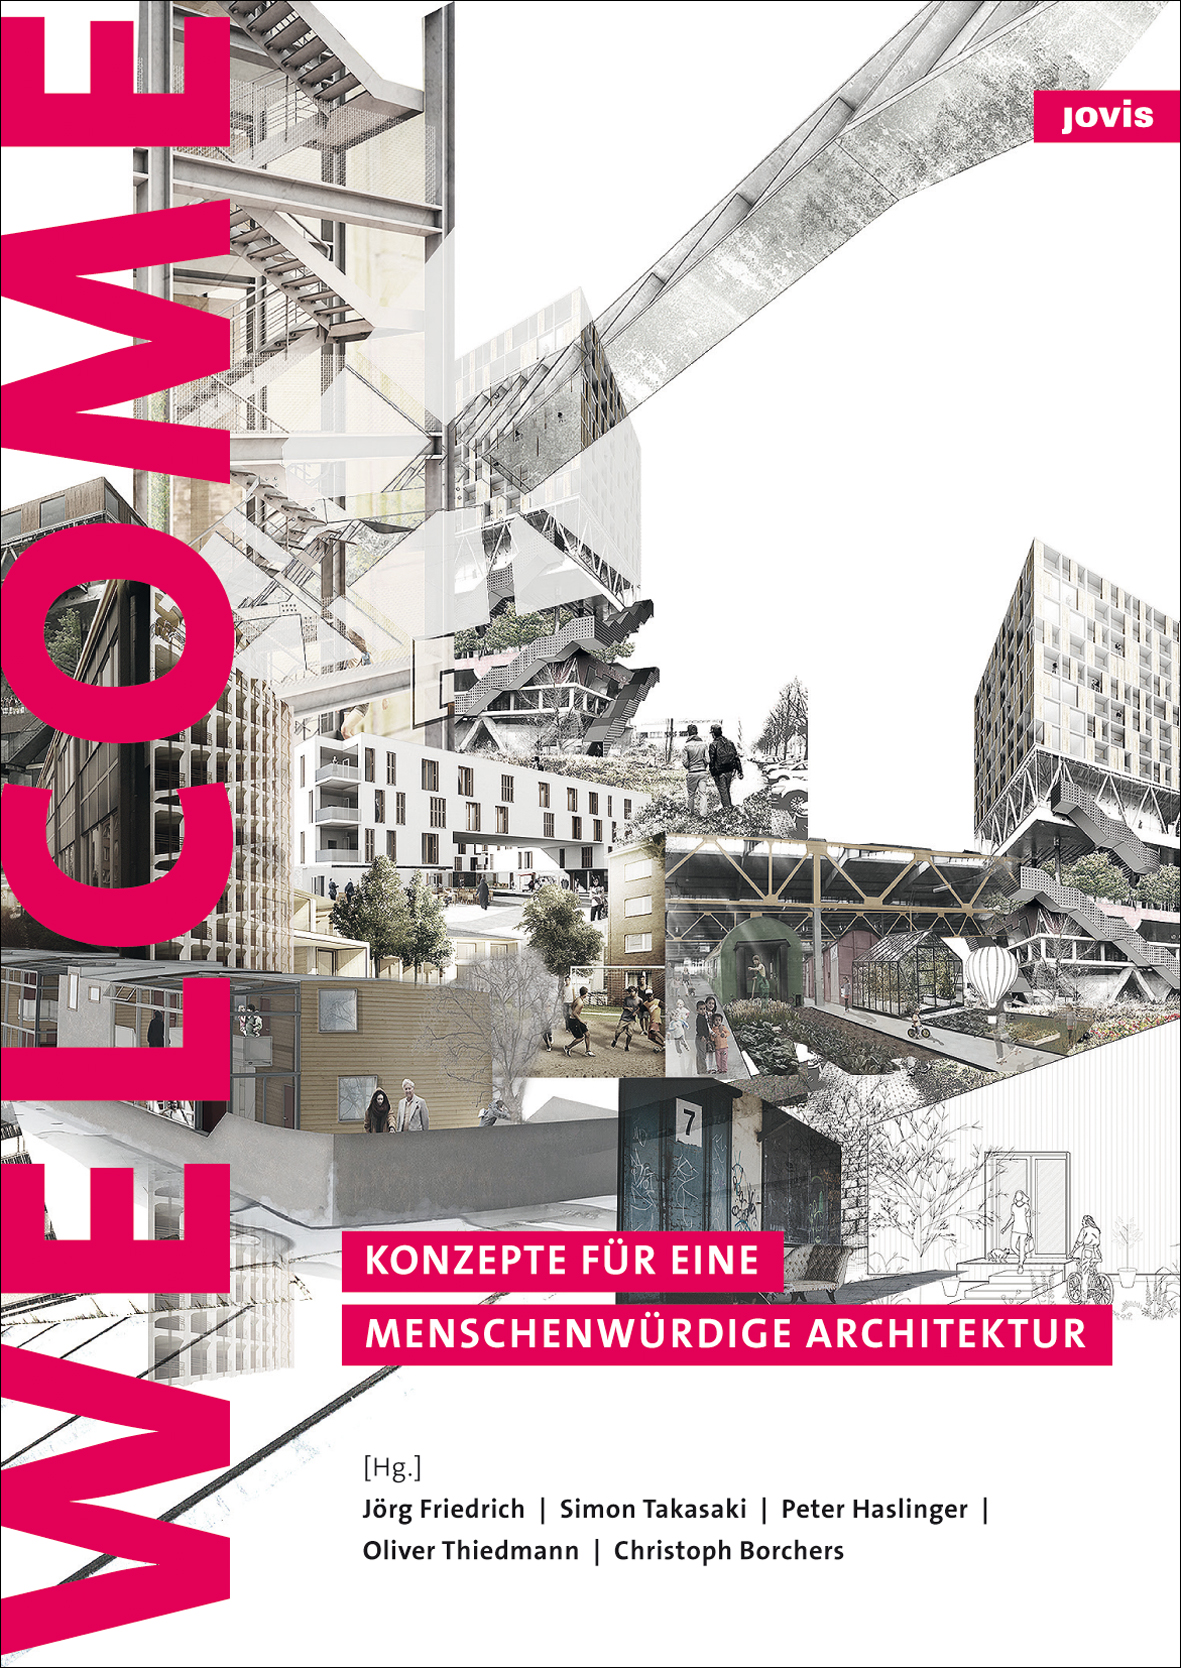 Cover © Refugees Welcome JOVIS Verlag